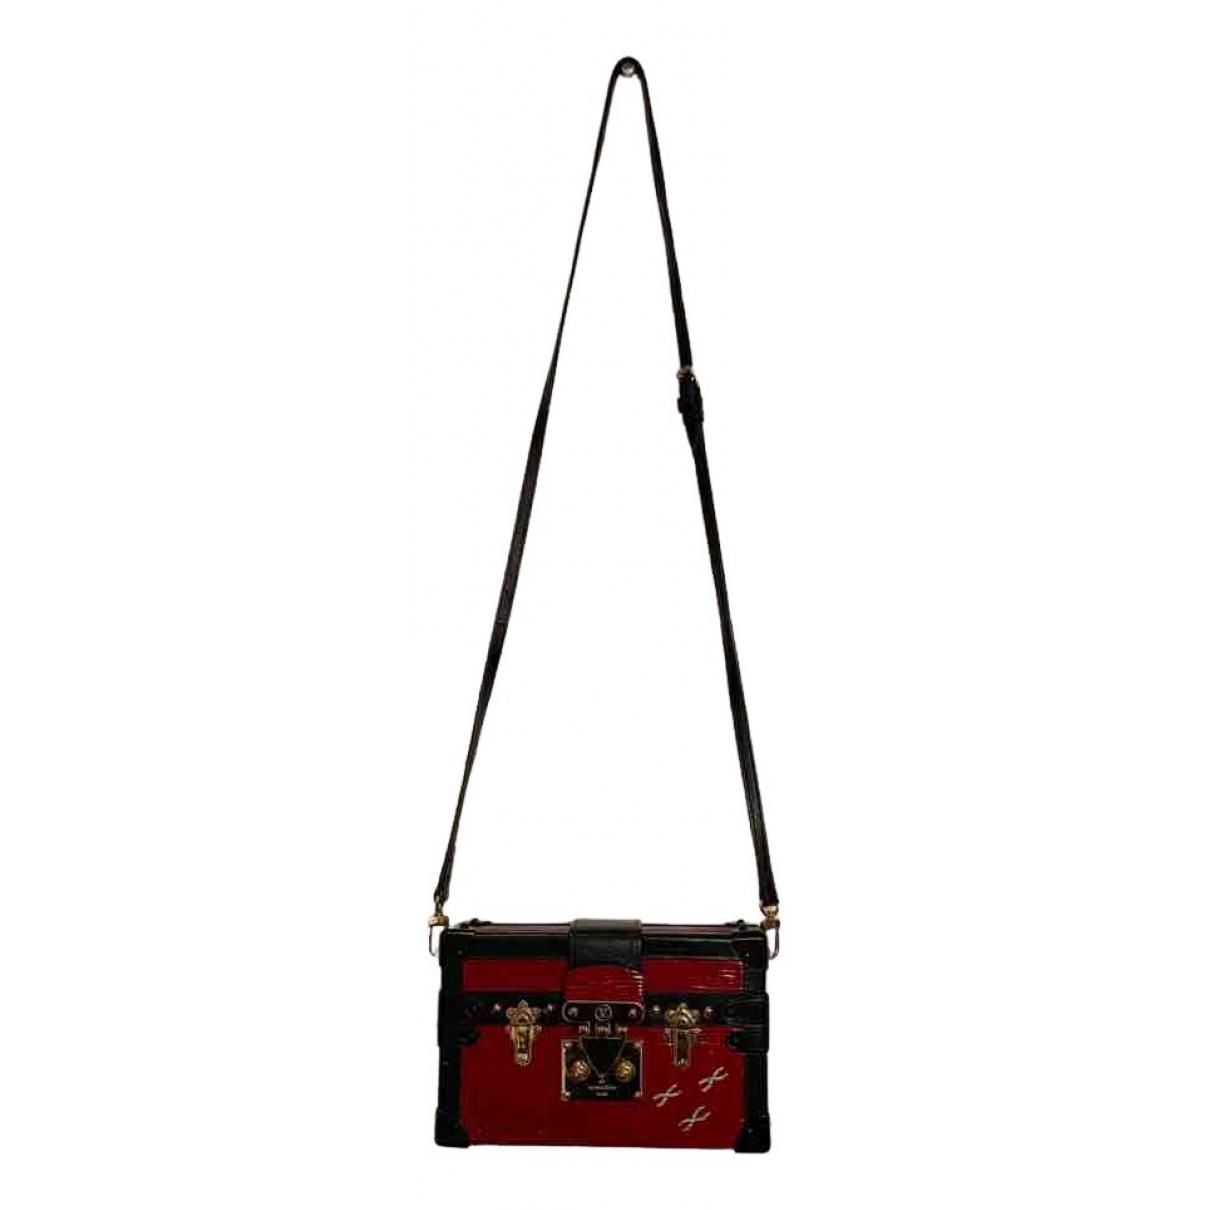 Louis Vuitton Petit Malle Red Leather handbag for Women N